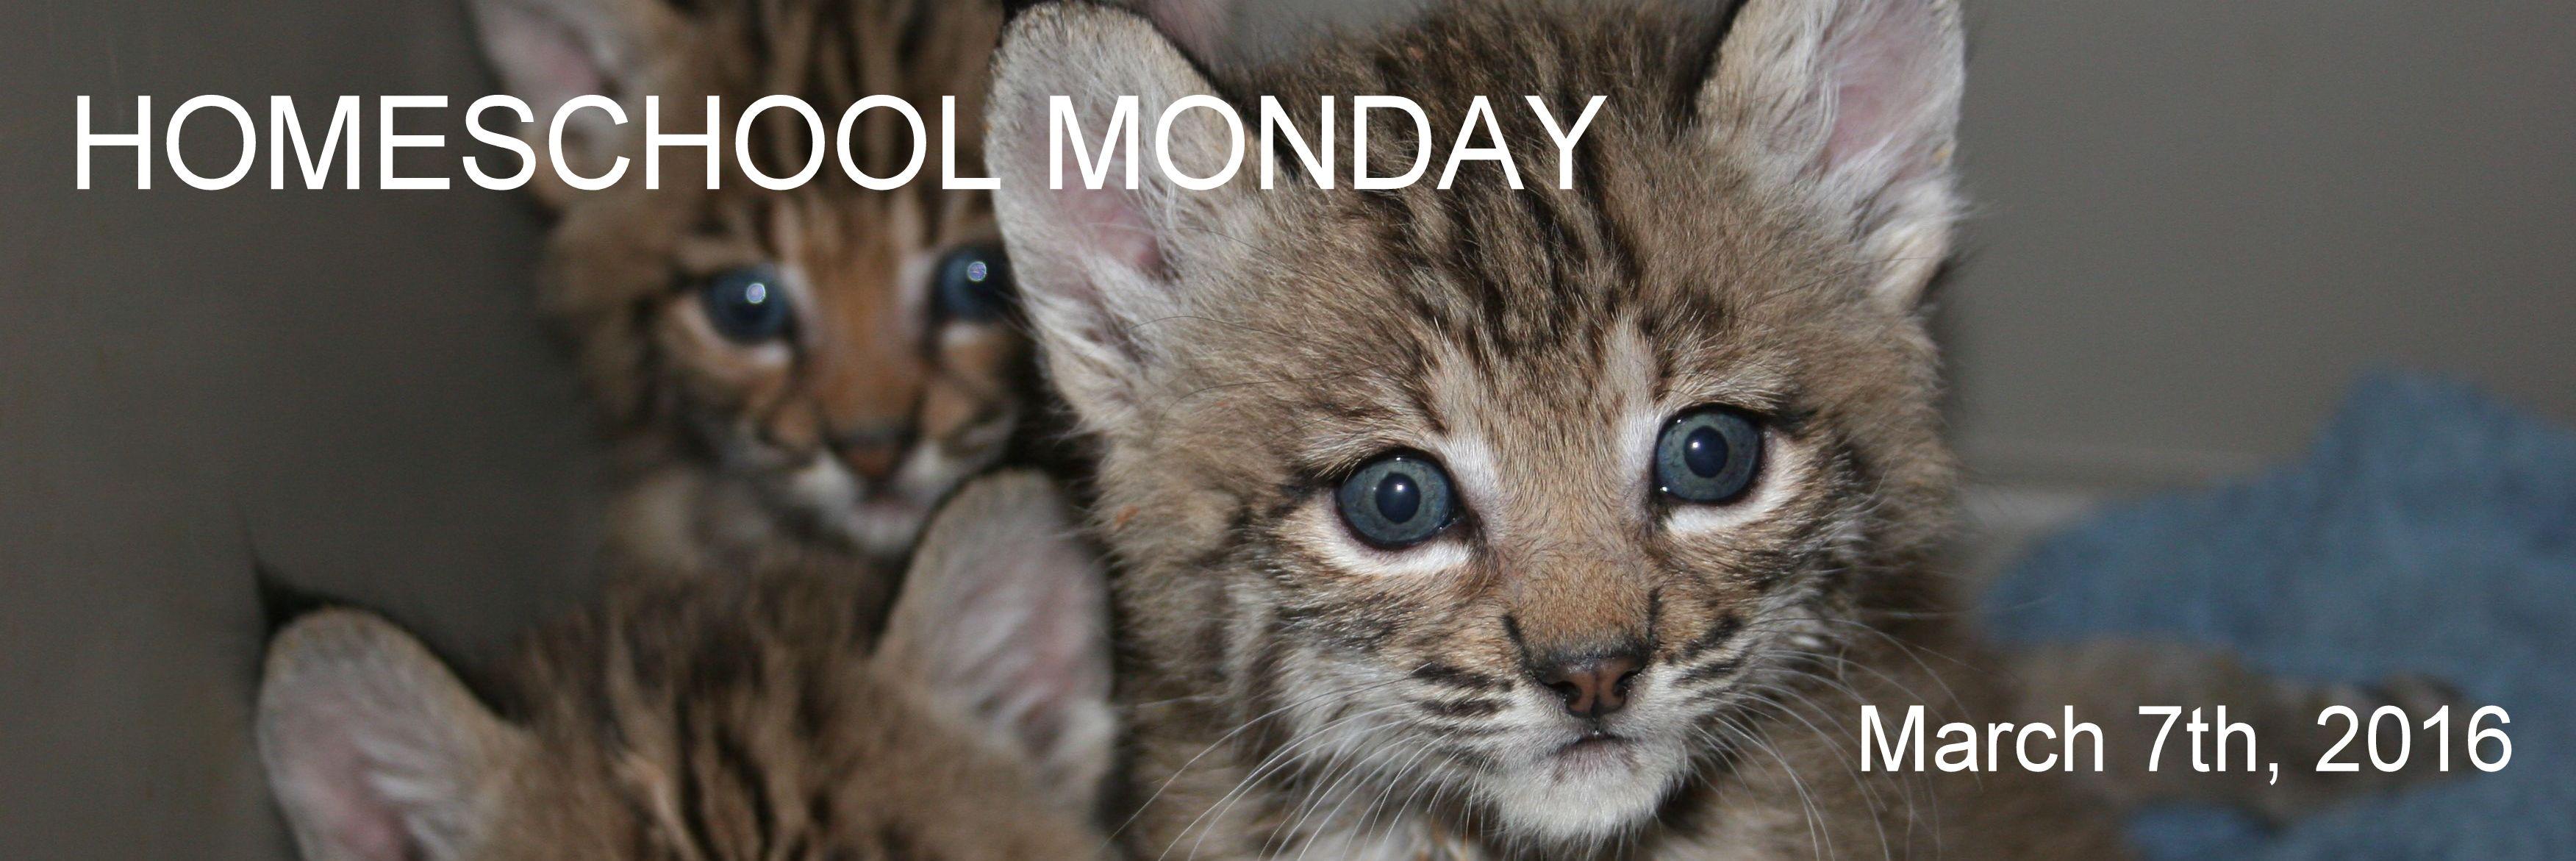 Homeschool Monday March